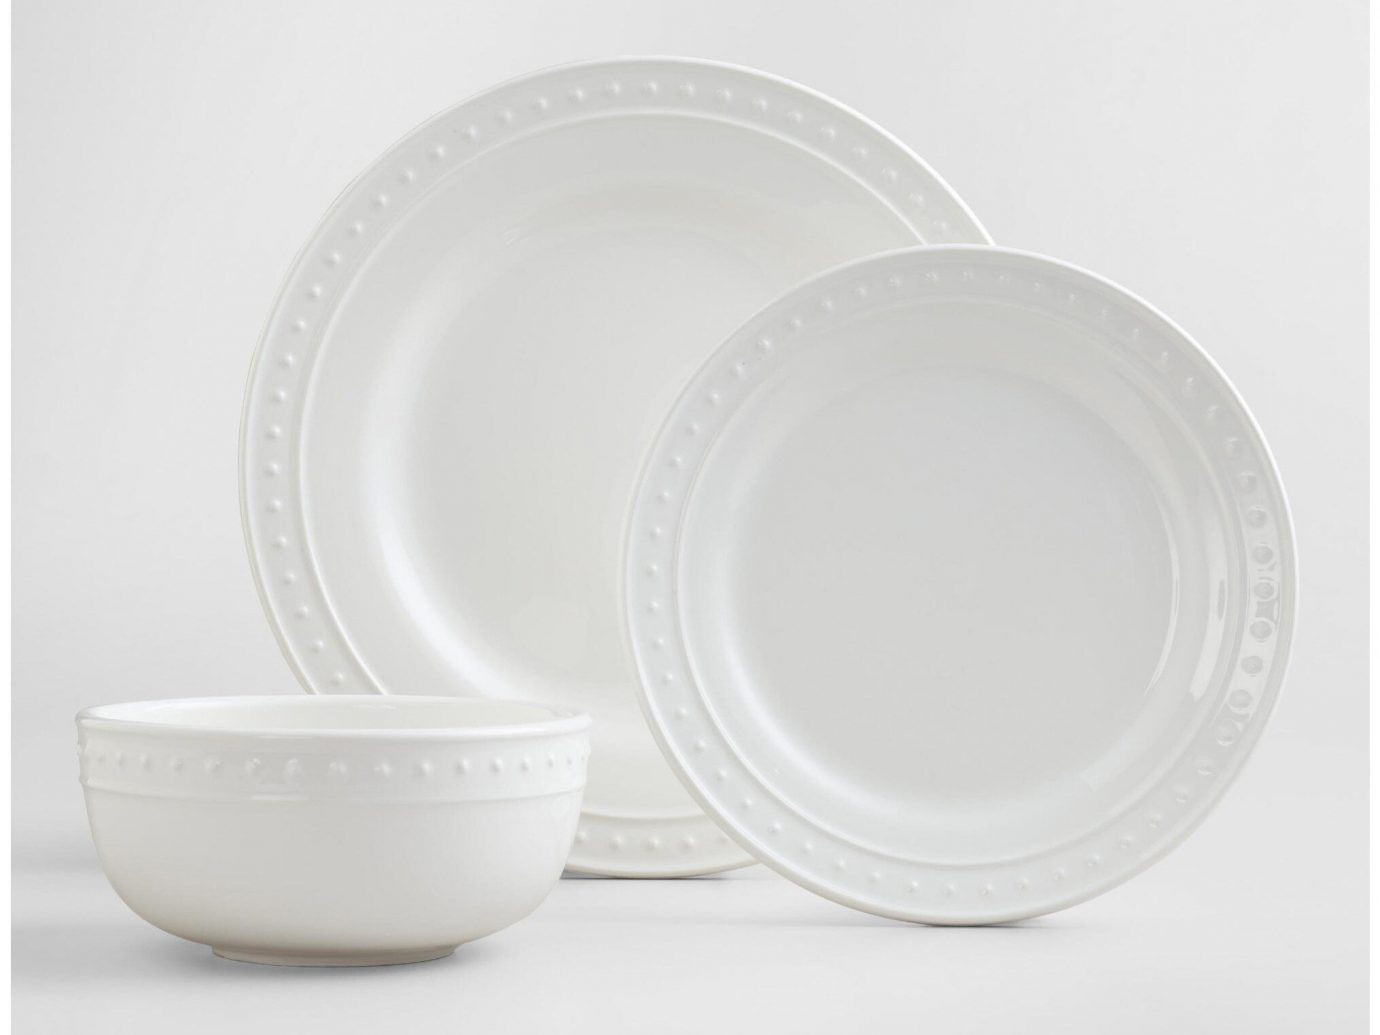 Style + Design Travel Shop dishware dinnerware set tableware white plate product product design porcelain serveware bowl cup saucer ceramic ware